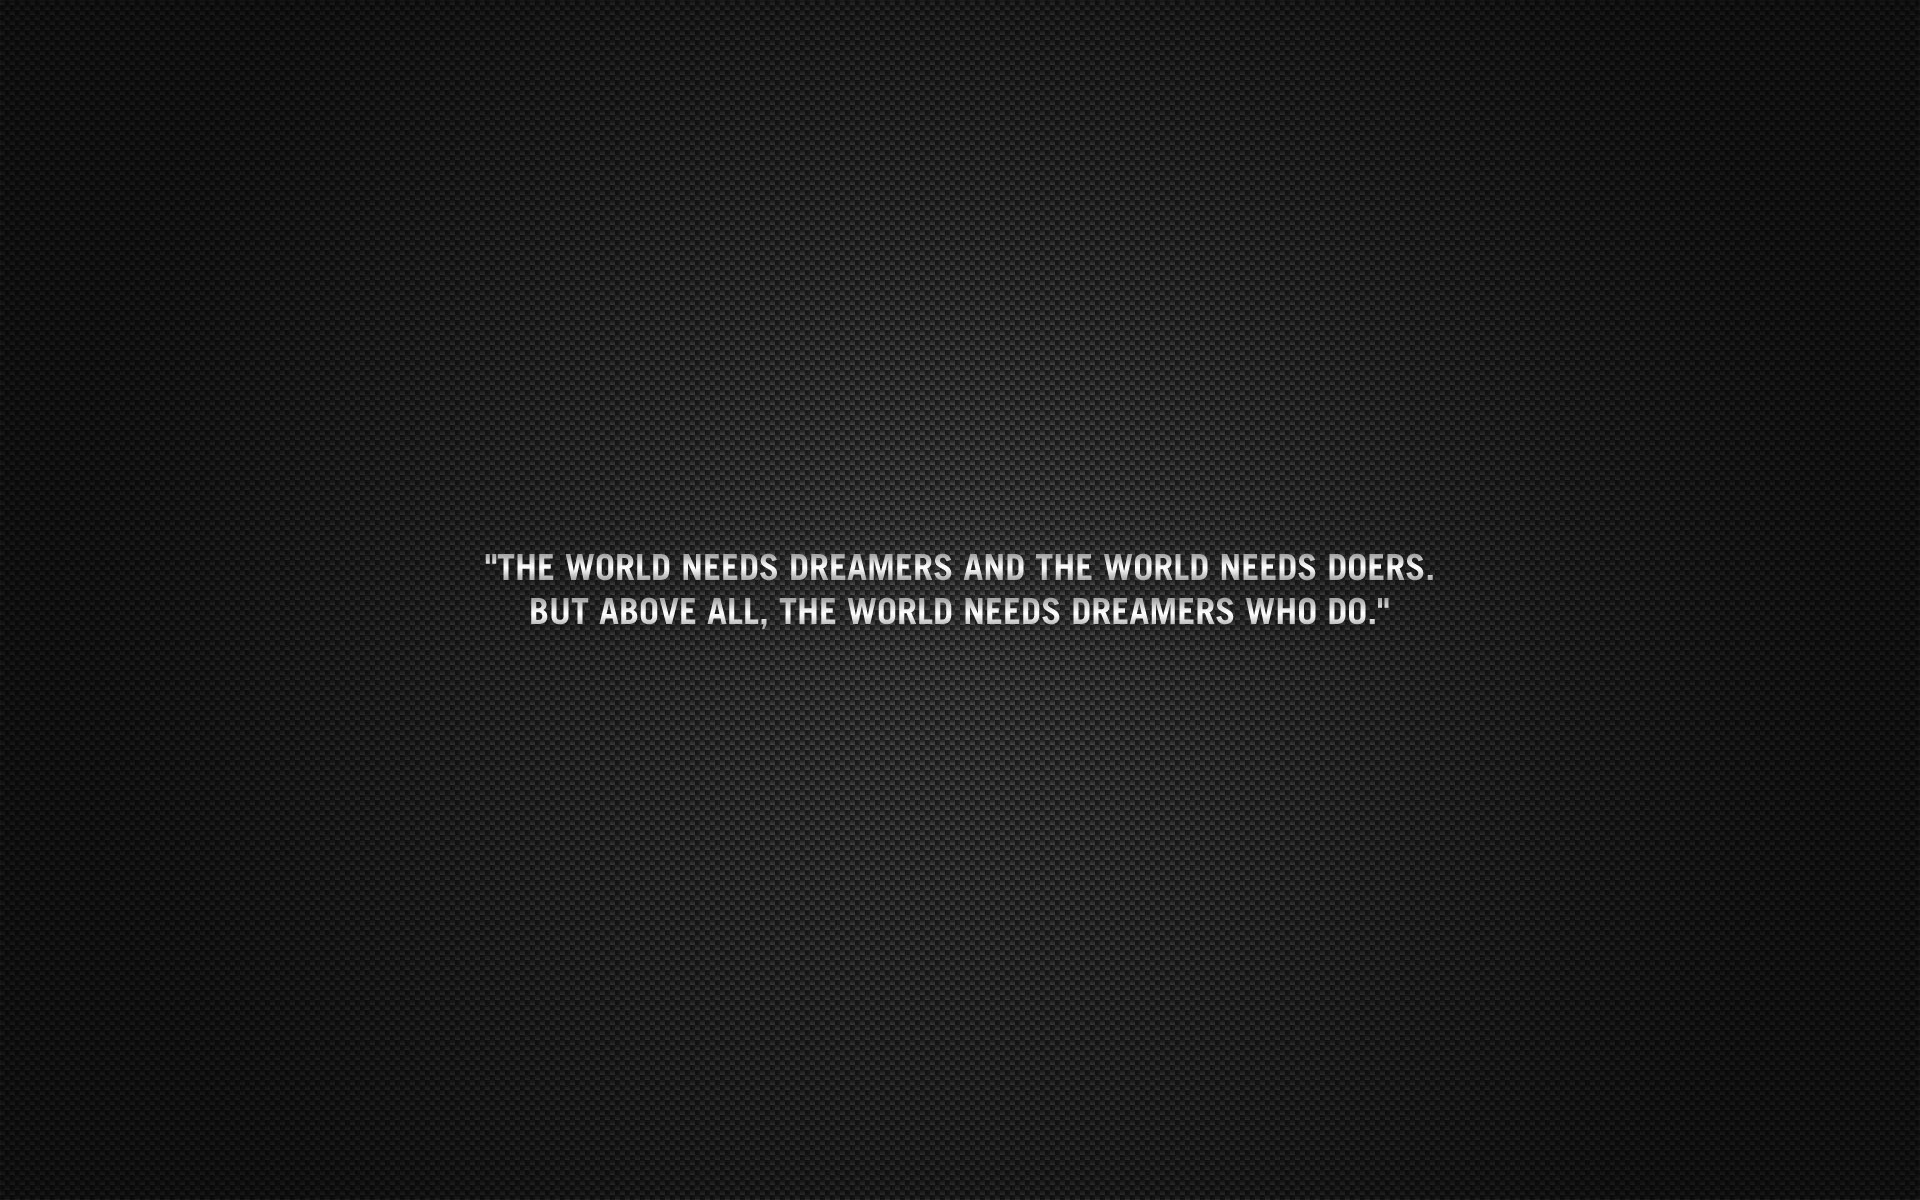 Doers Quotes. QuotesGram